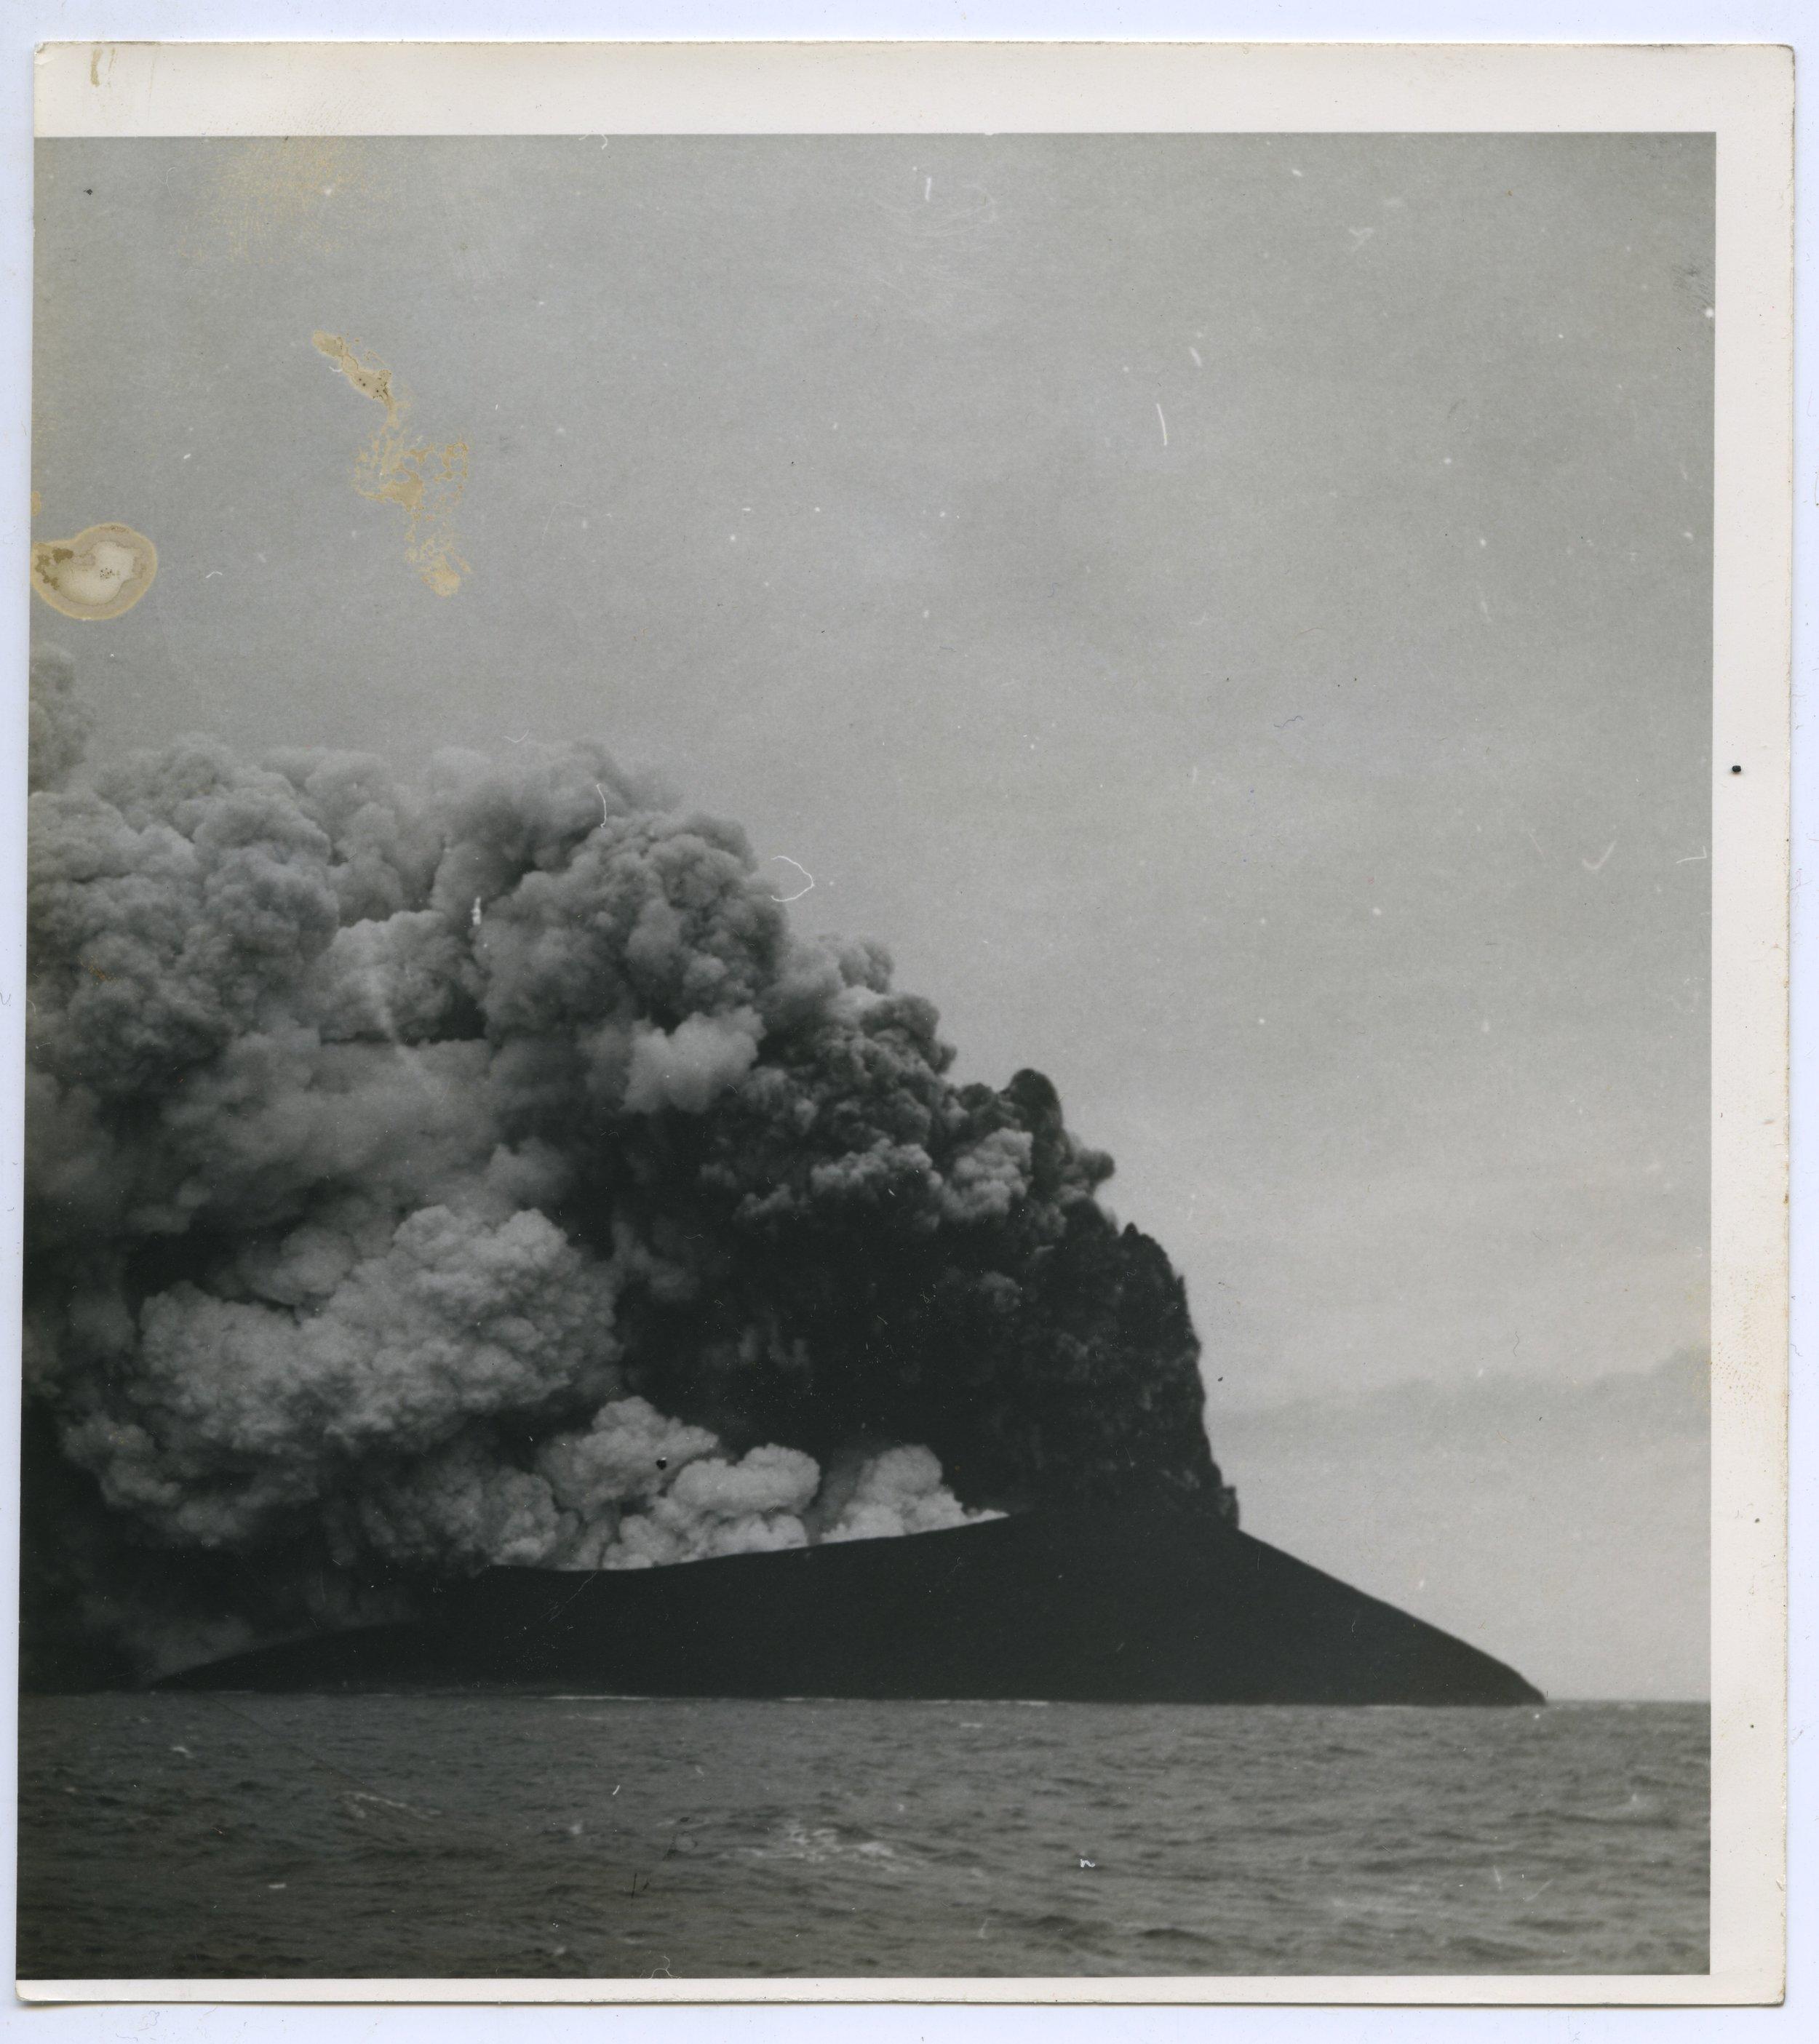 stursay eruption photog swimming chp 8 subaqueous  1.jpeg